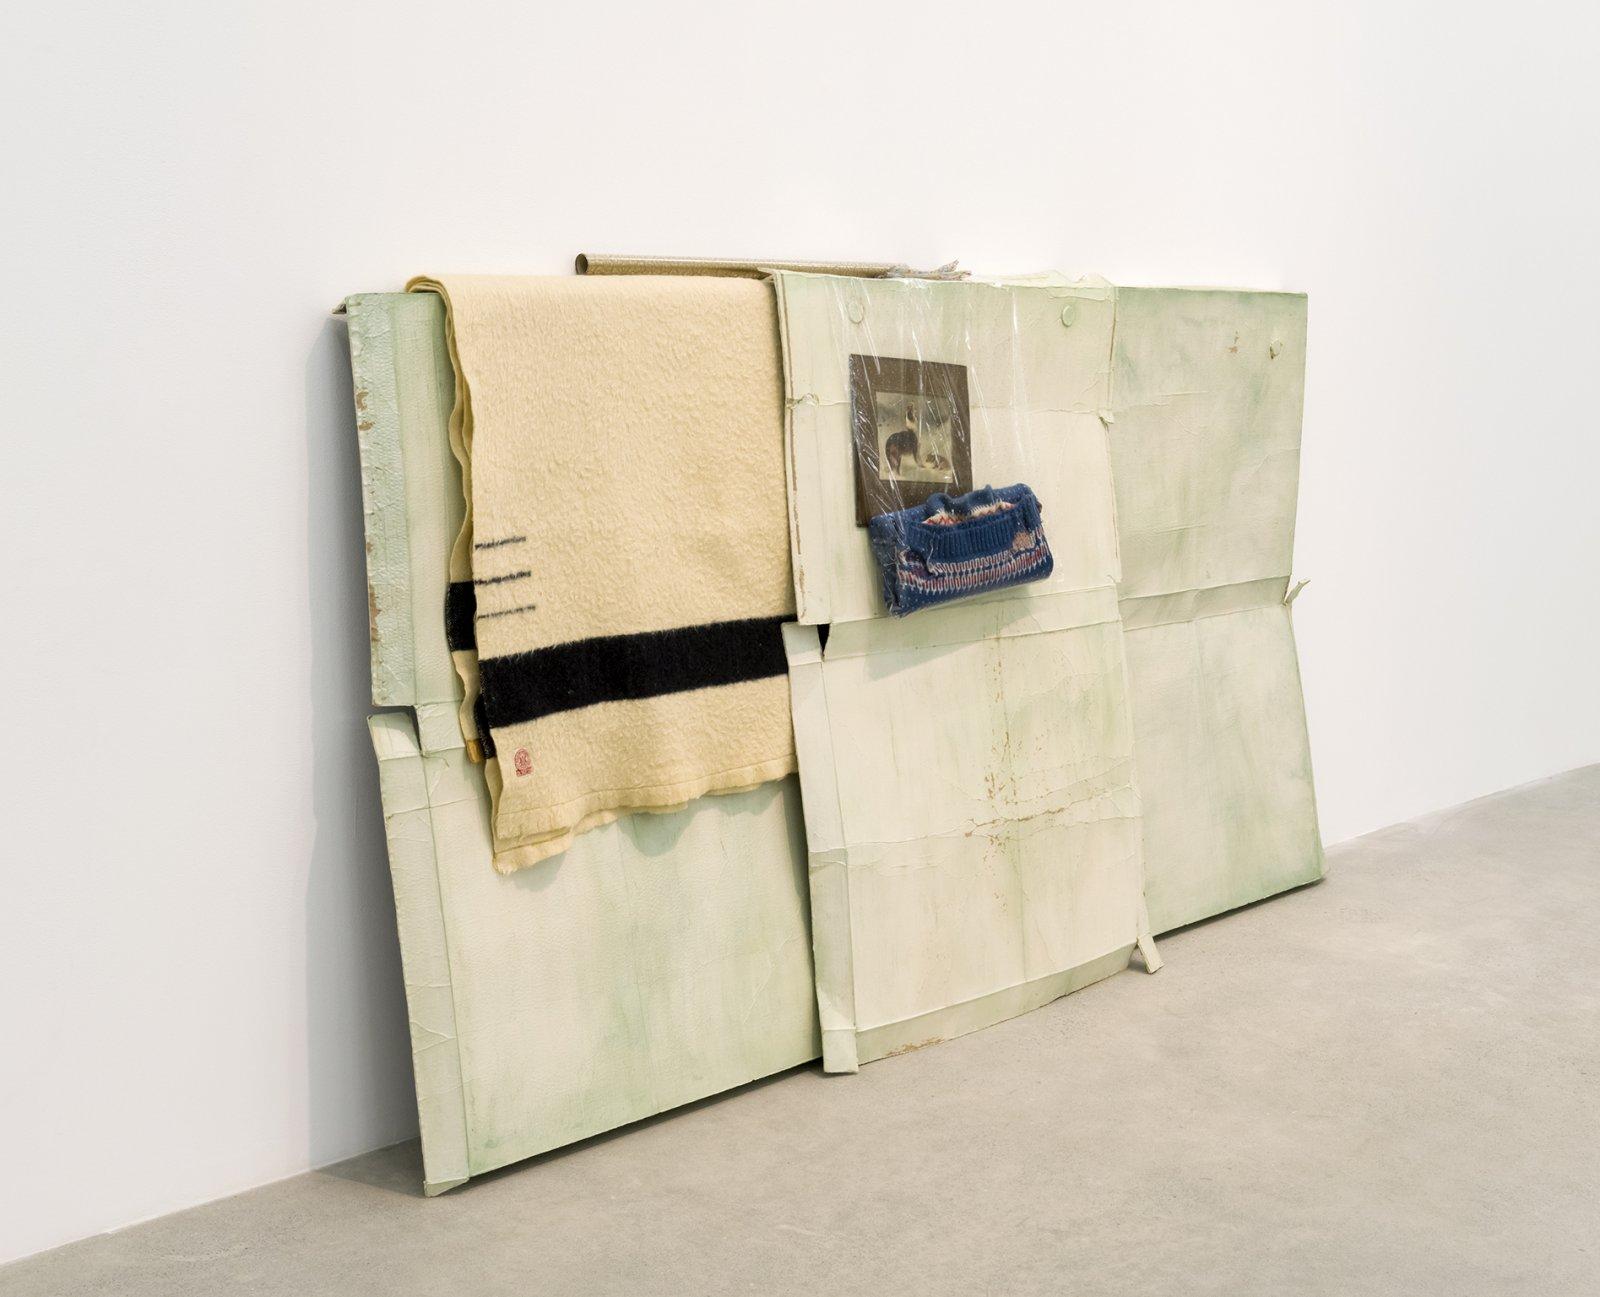 Liz Magor, Good Shepherd, 2016, polymerized gypsum, wool, plastic bags, plastic sheet, cardboard, 53 x 103 x 12 in. (133 x 262 x 31 cm) by Liz Magor